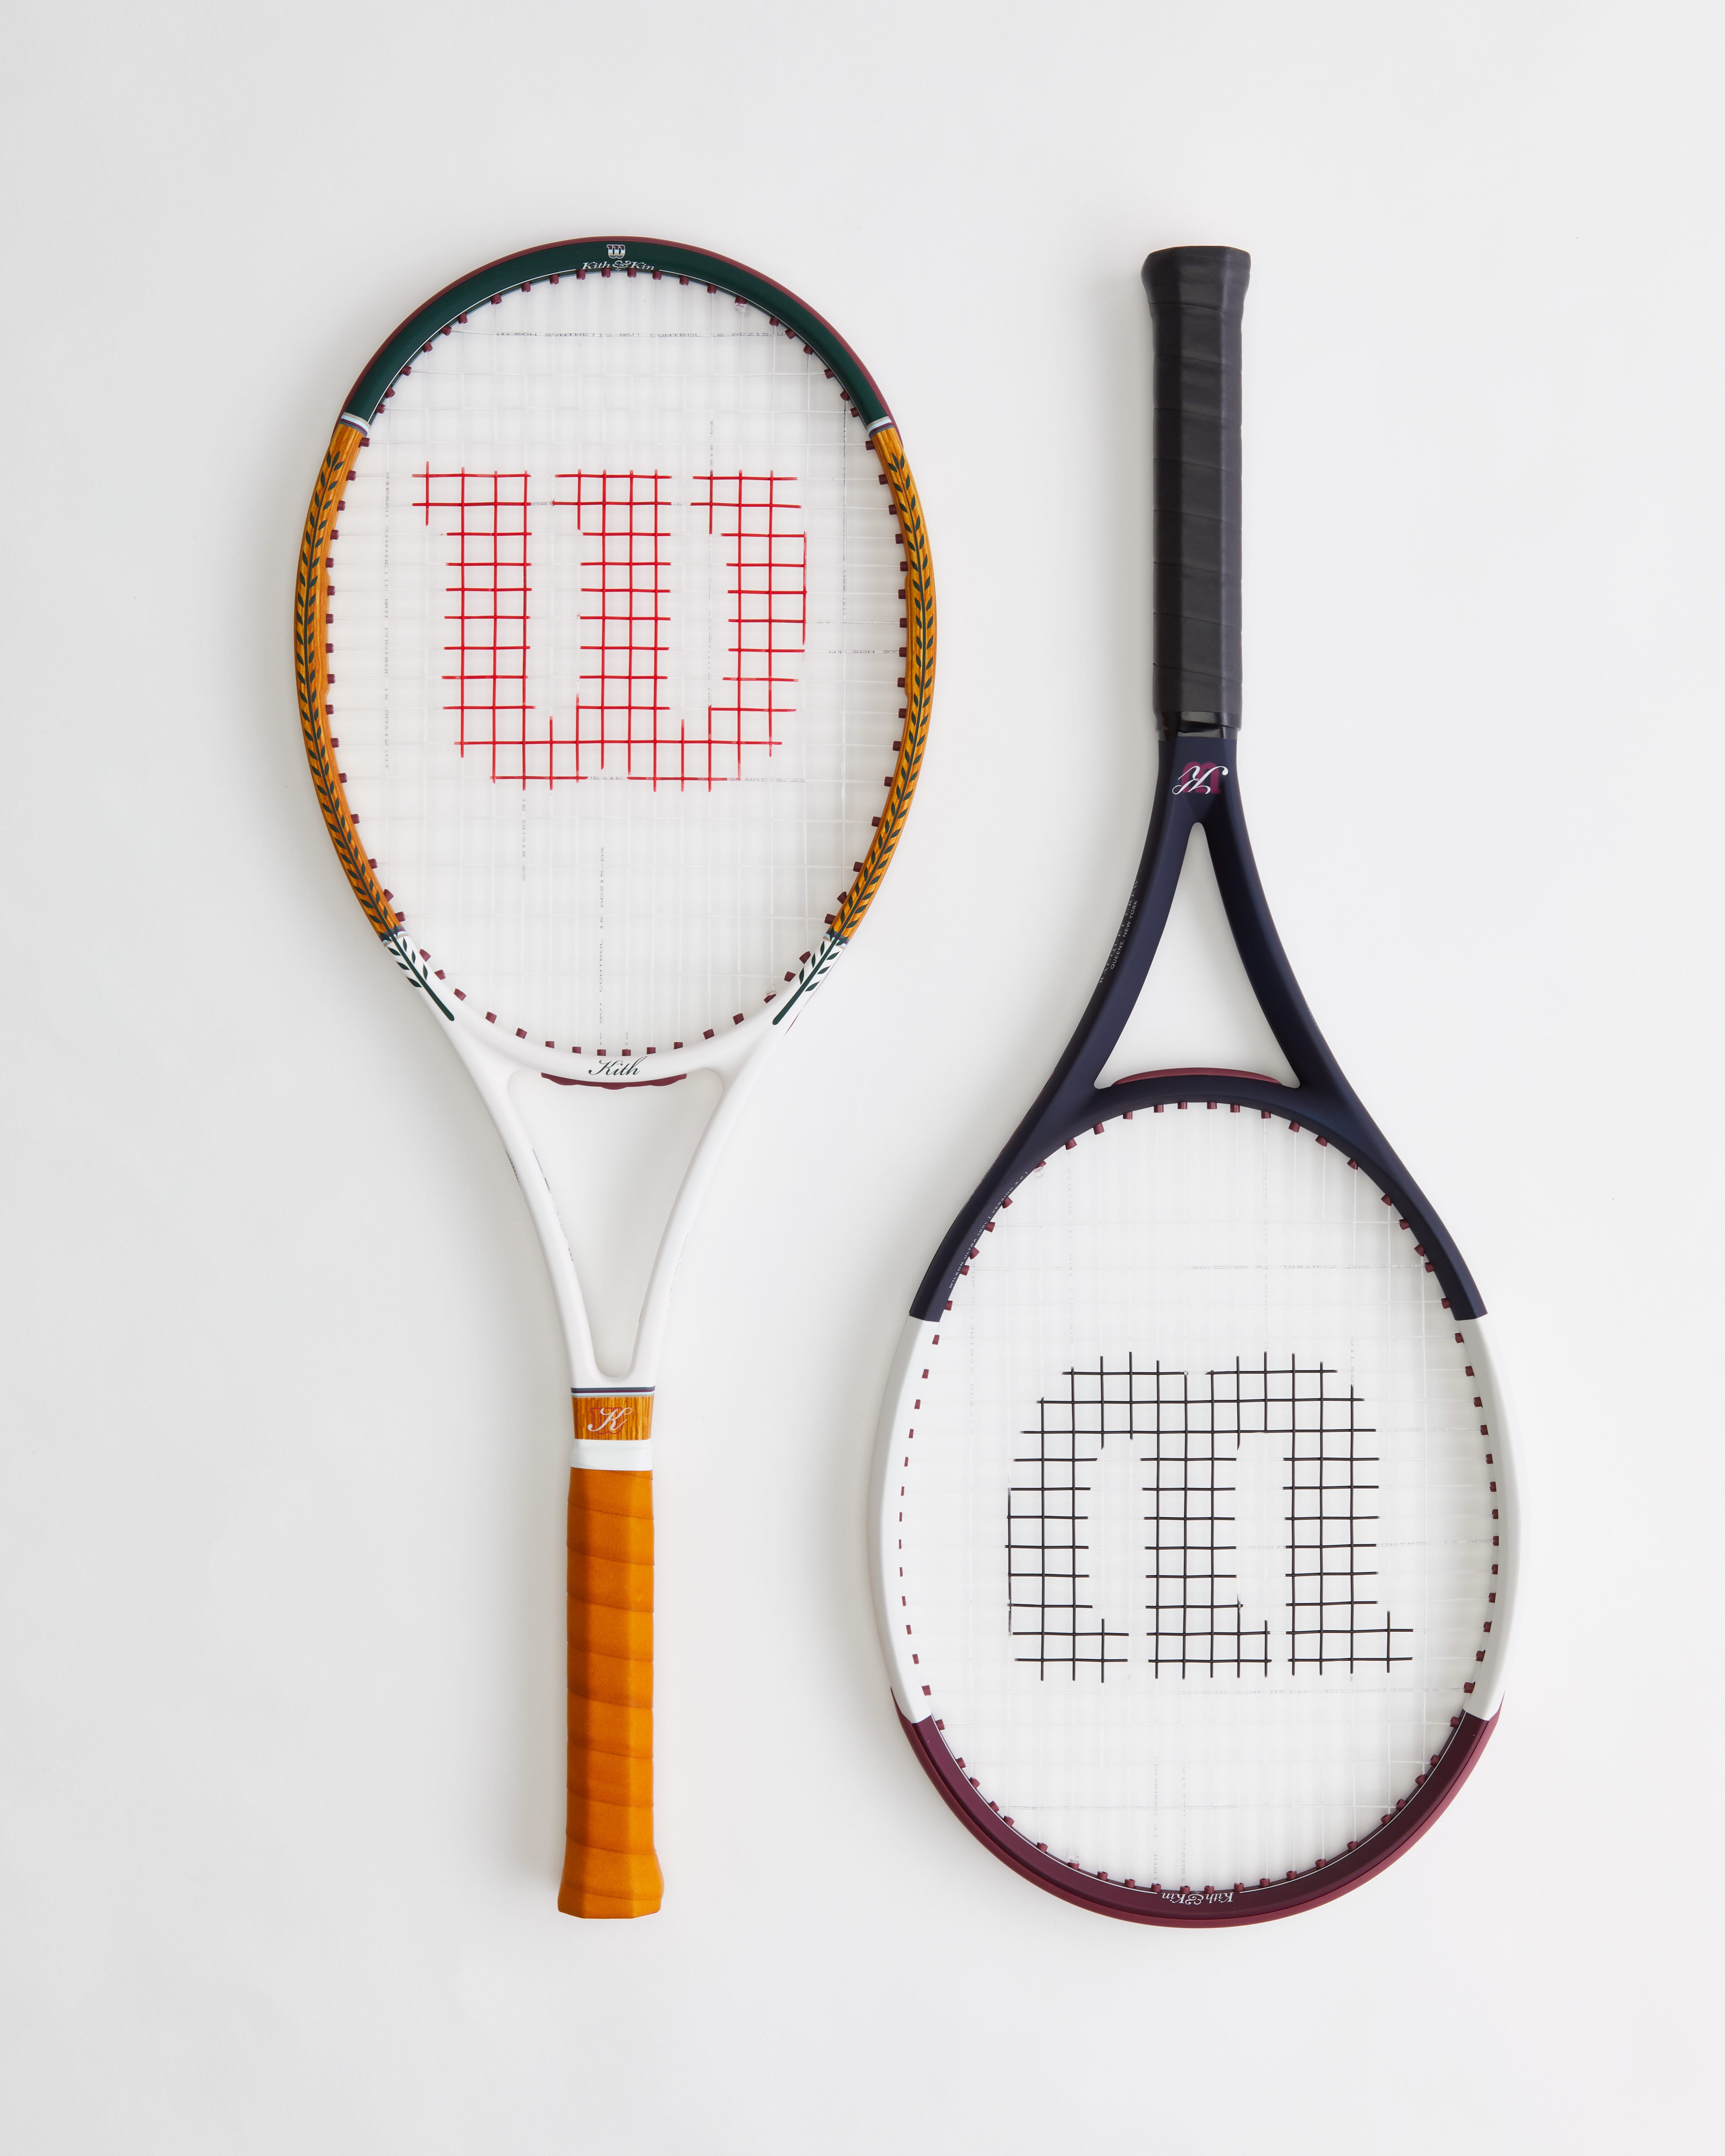 kith wilson rackets